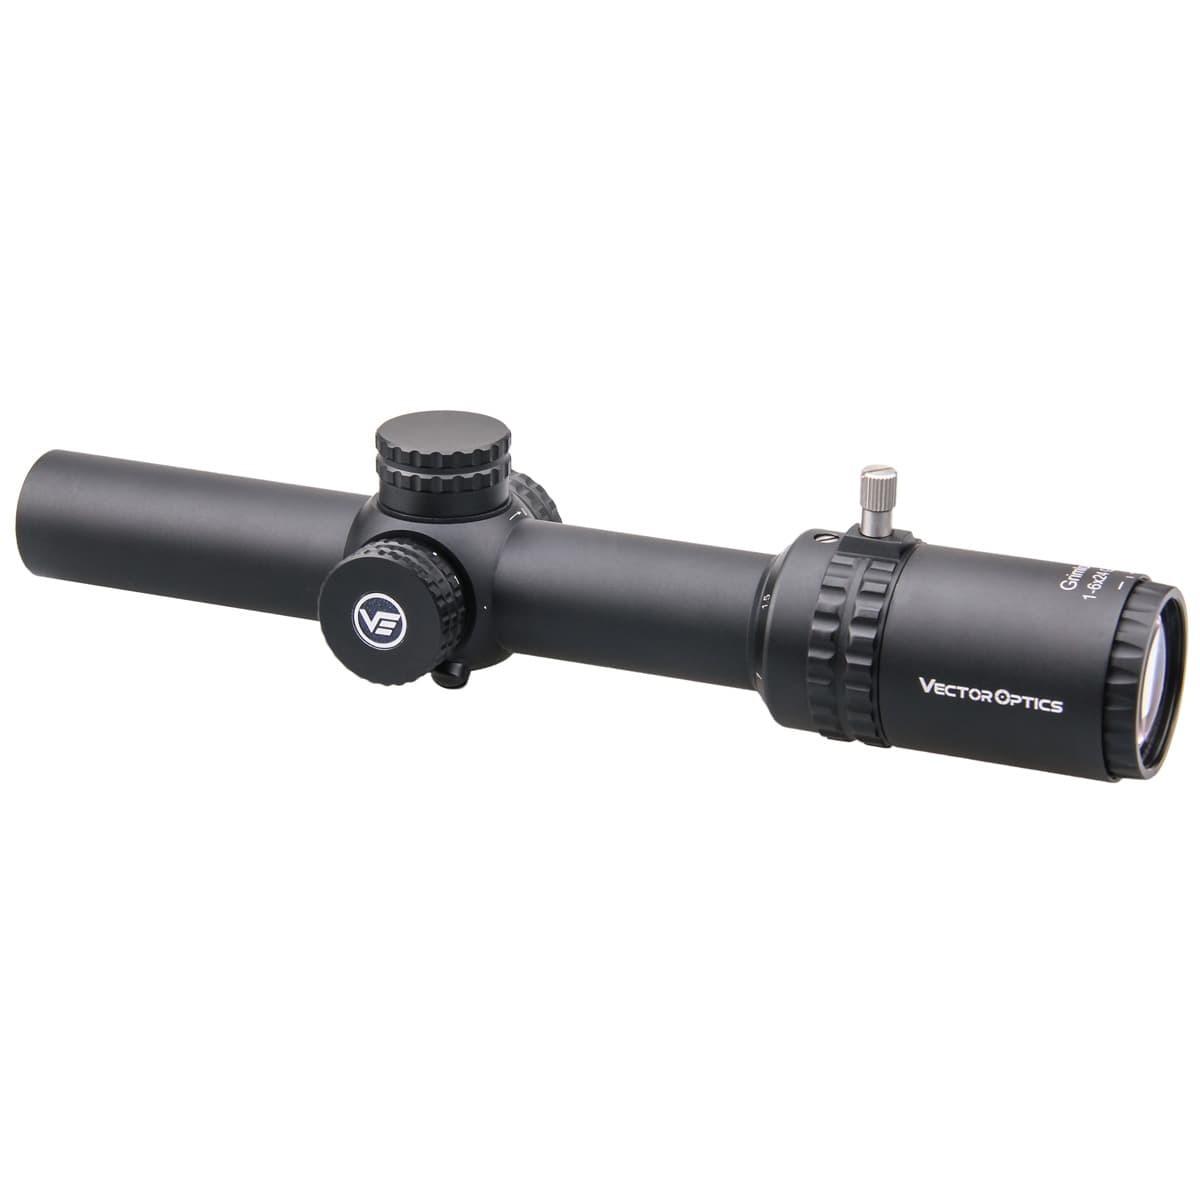 Grimlock 1-6x24SFP GenII Riflescope